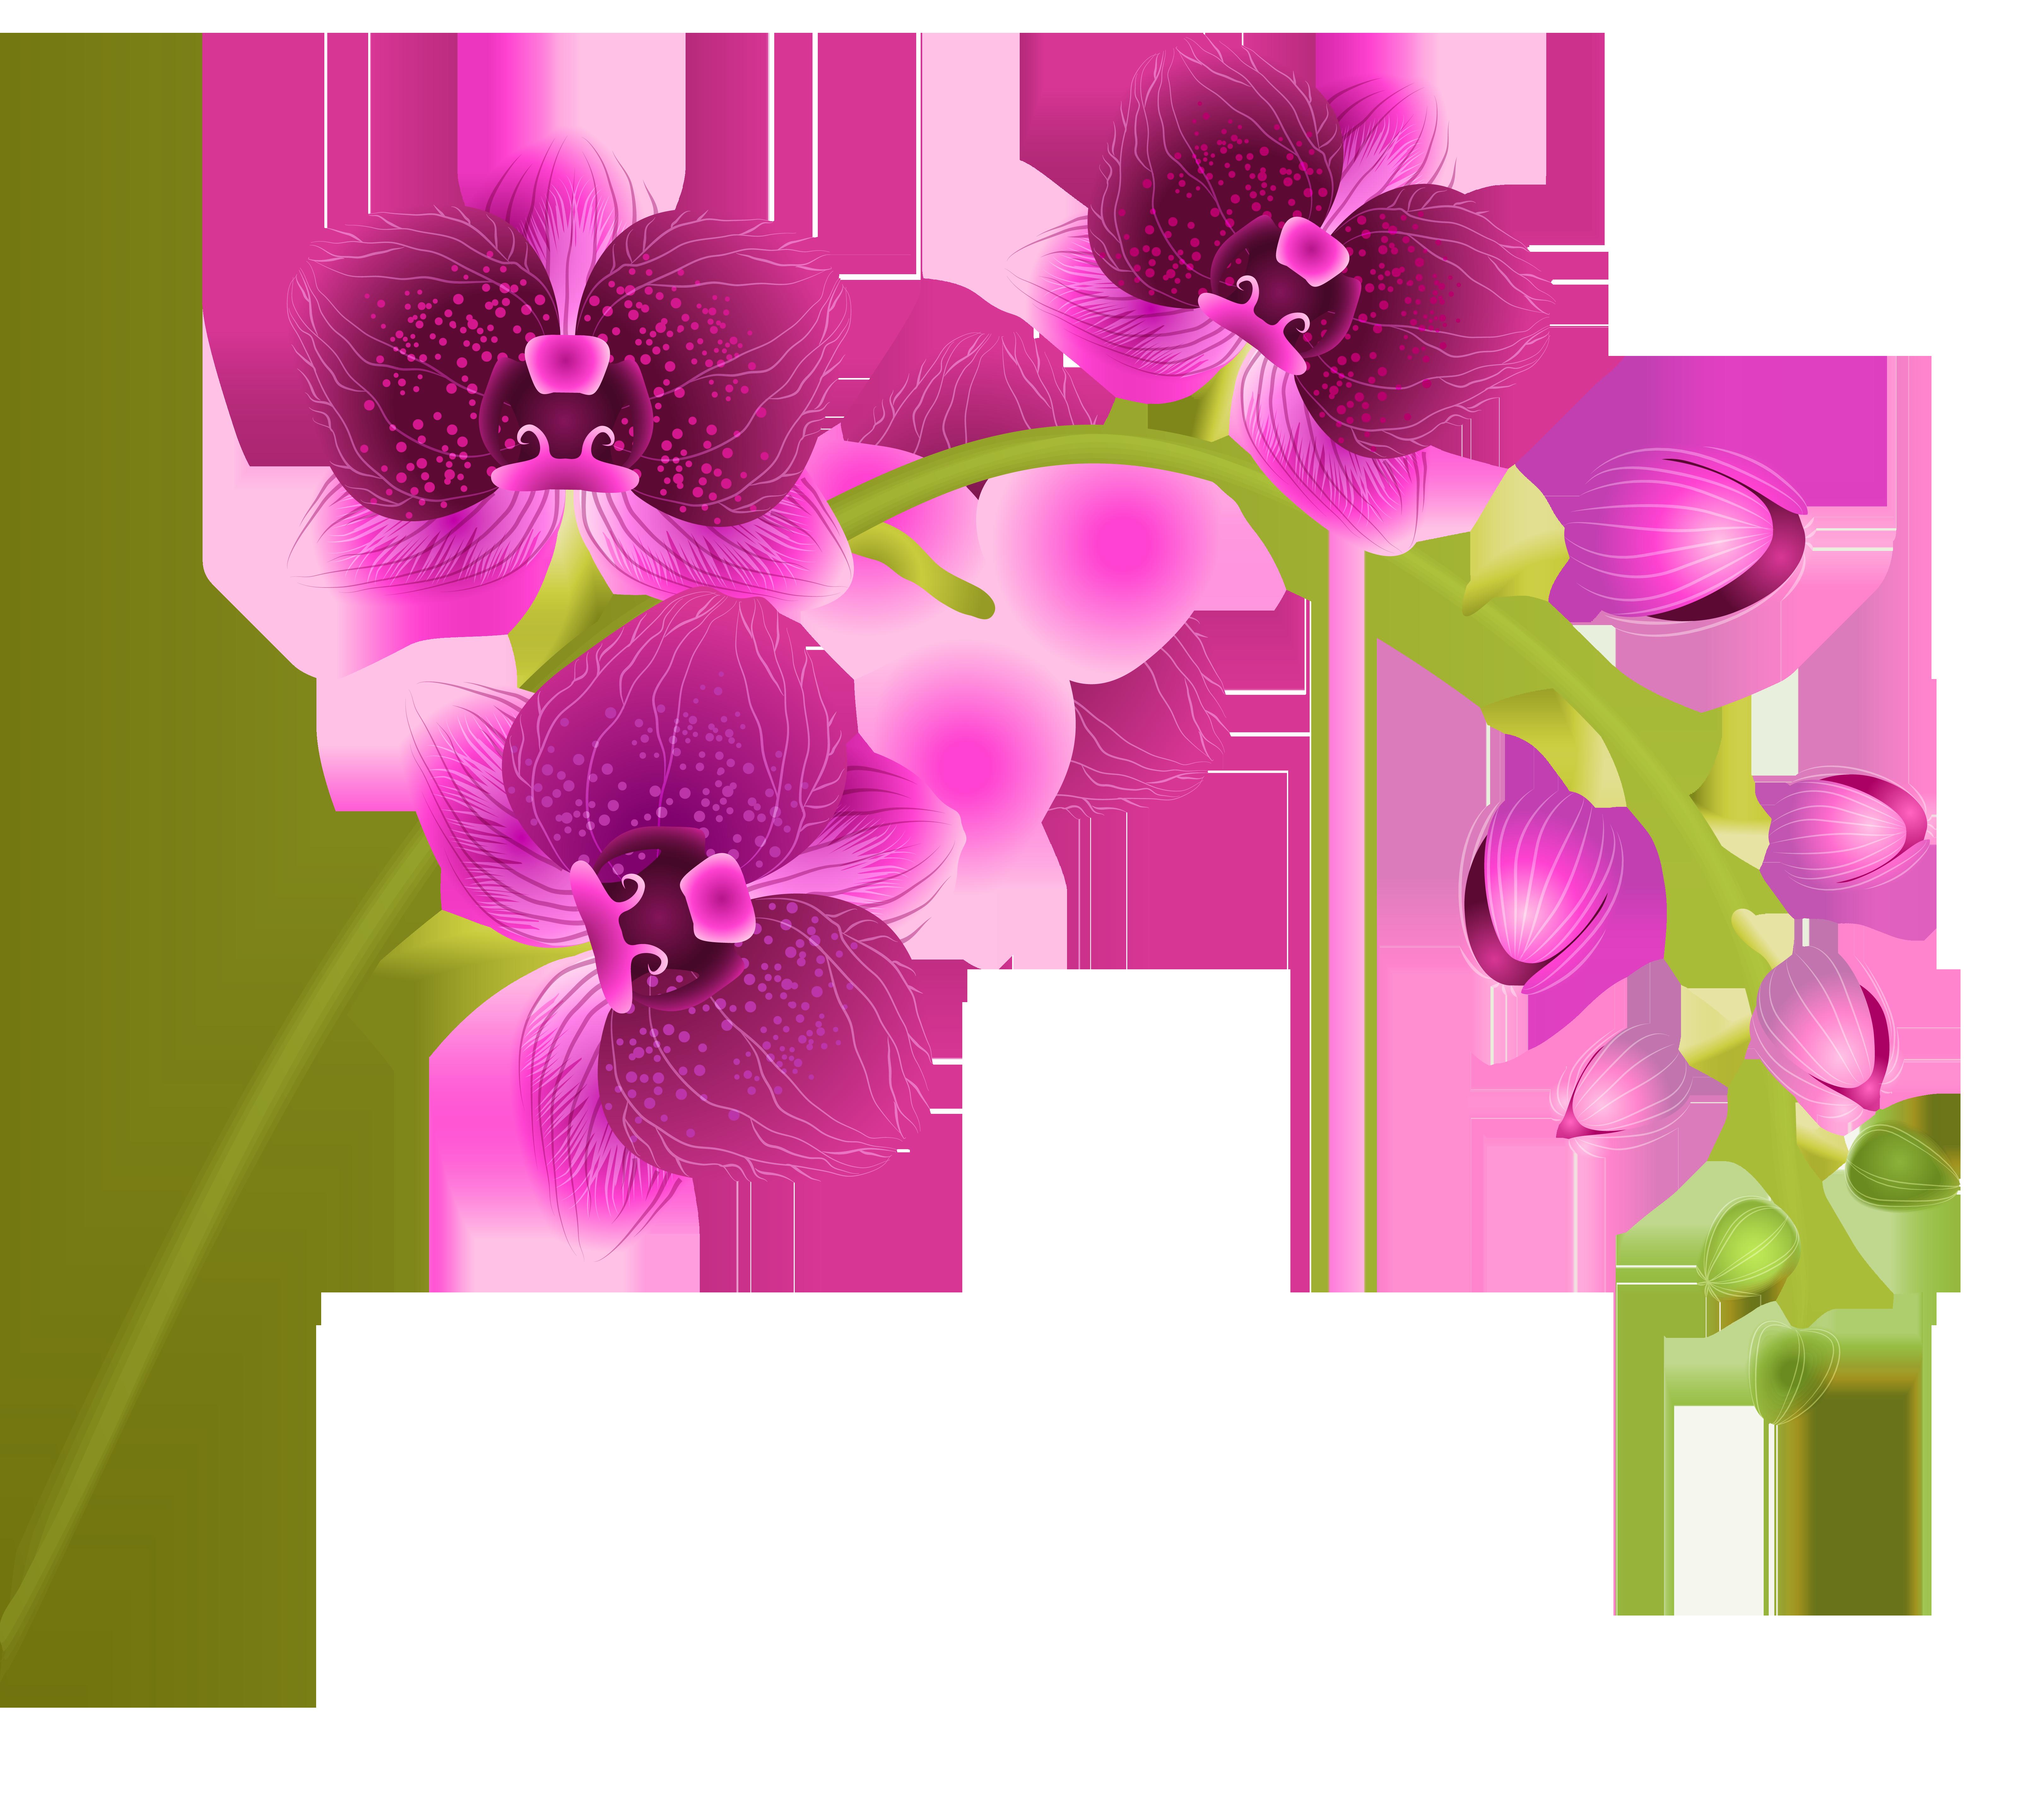 Orchid clipart images clip Orchid Flower Transparent PNG Clip Art Image | Gallery ... clip